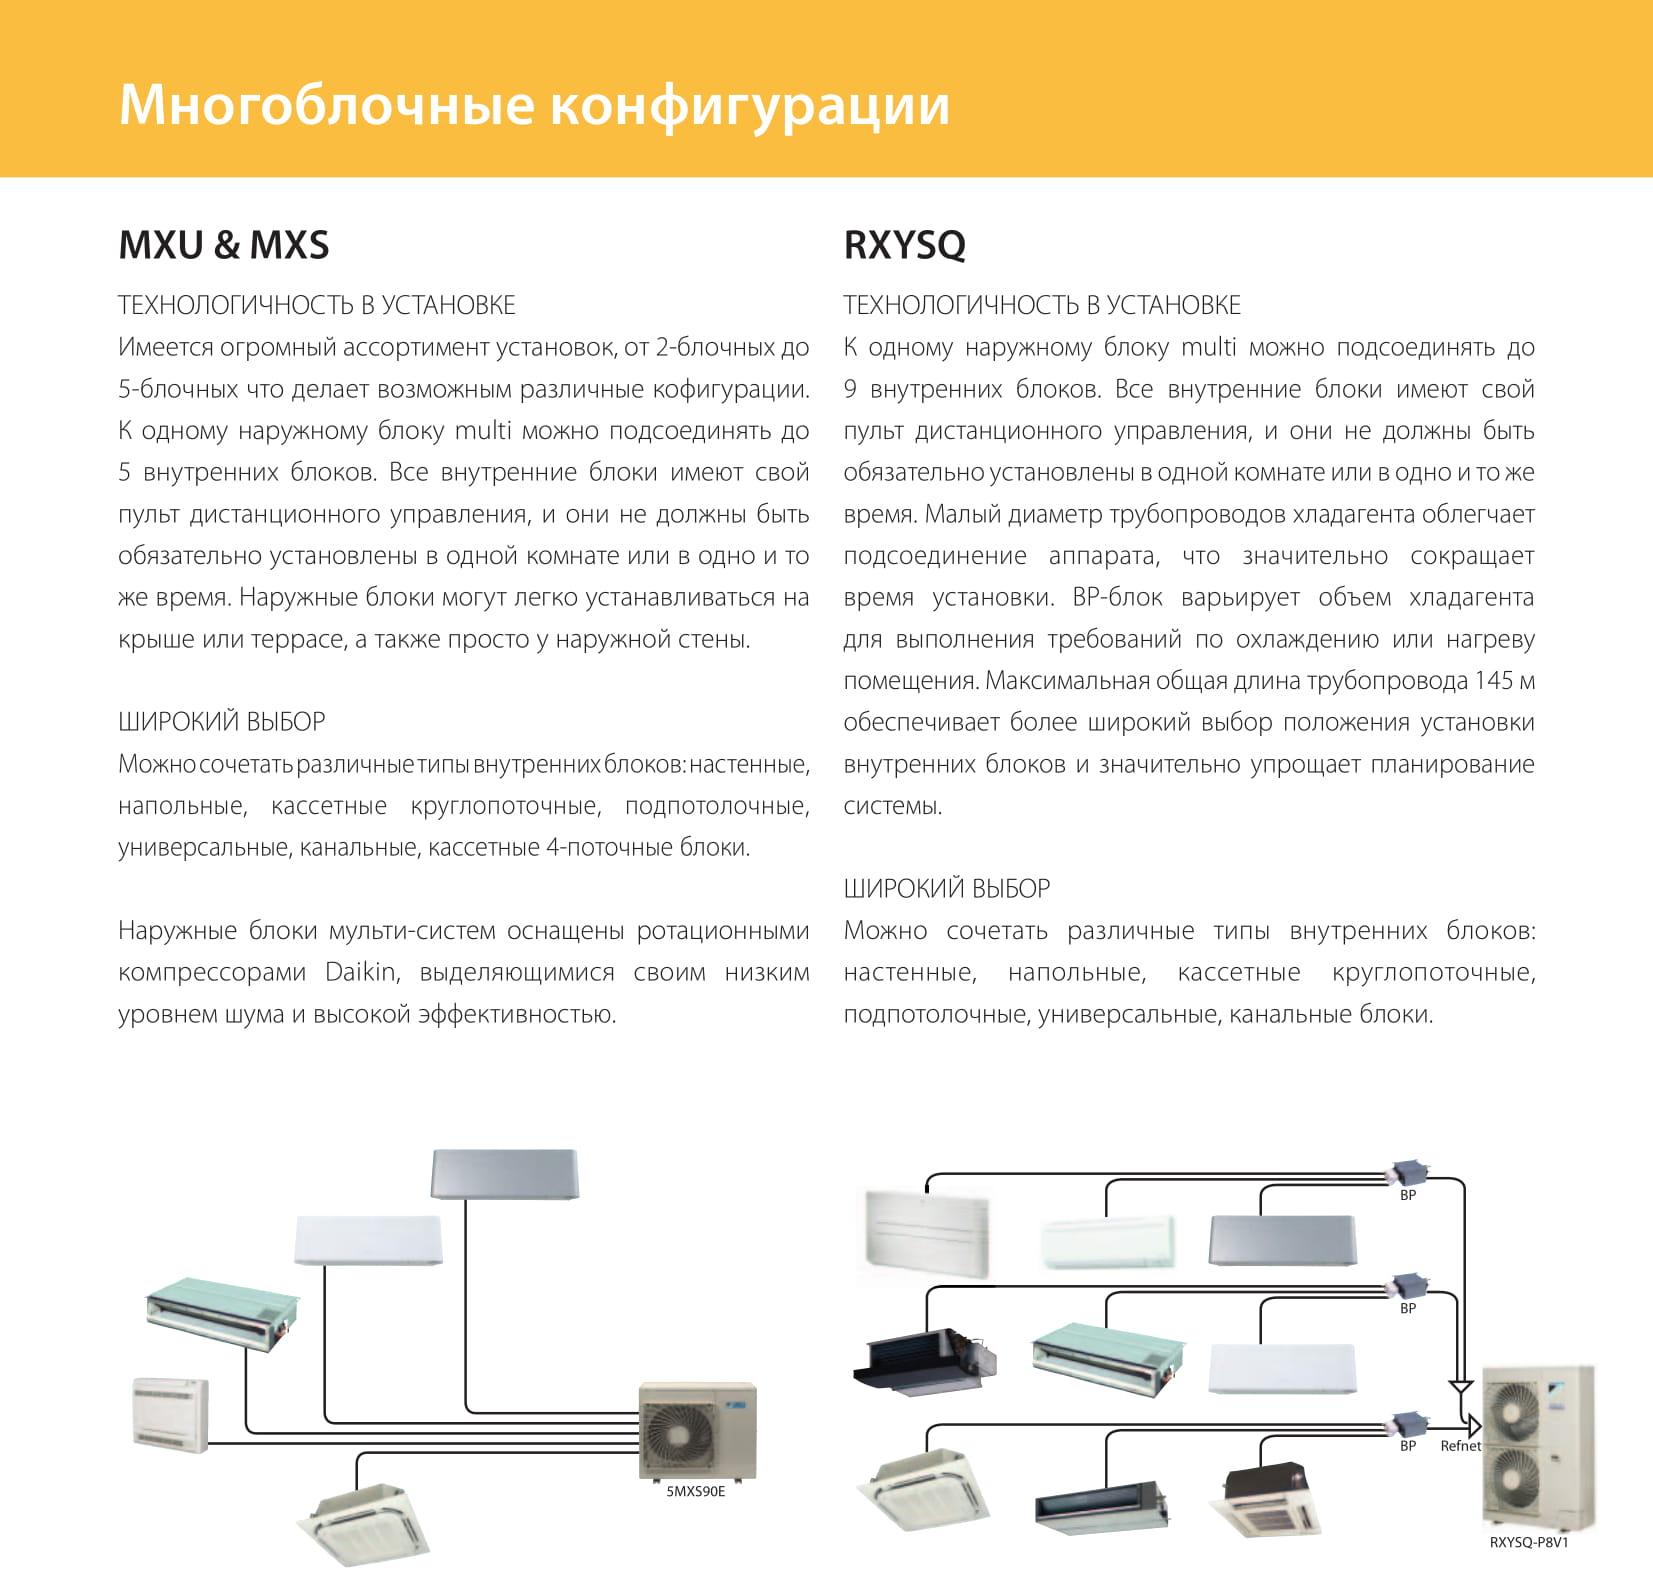 VRV®III-S Тепловой насос RXYSQ-P8V1